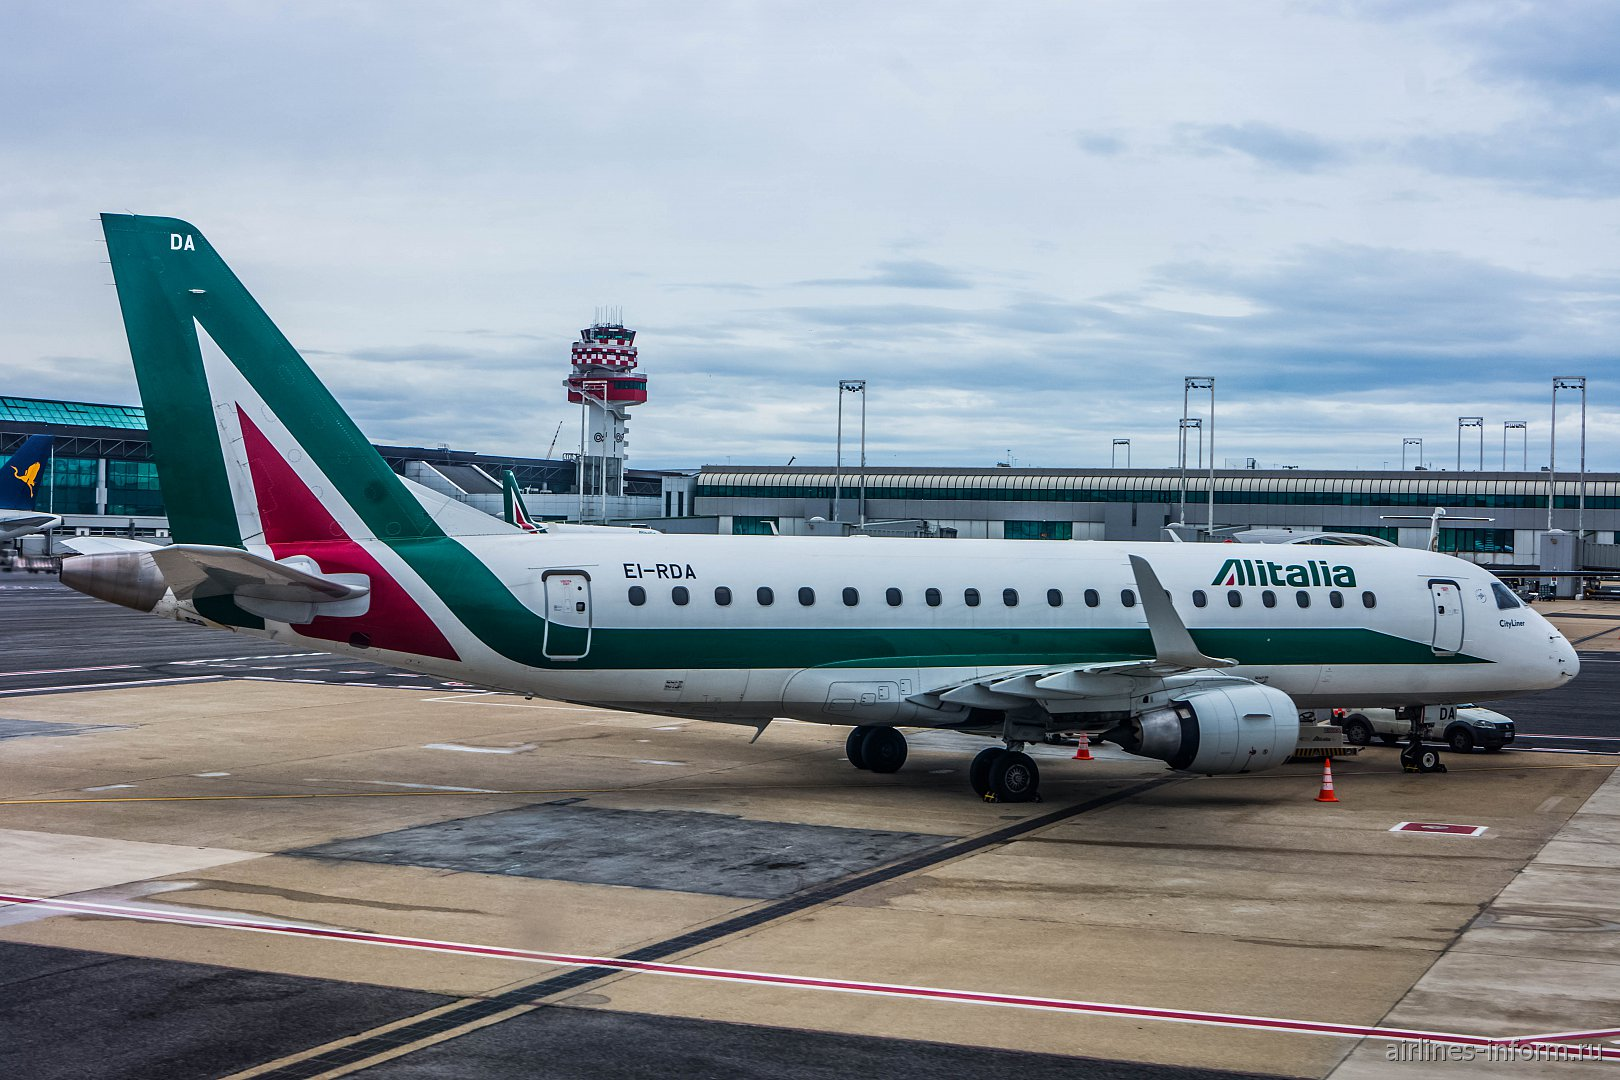 Embraer 175 EI-RDA авиакомпании Alitalia CityLiner в аэропорту Рим Фьюмичино